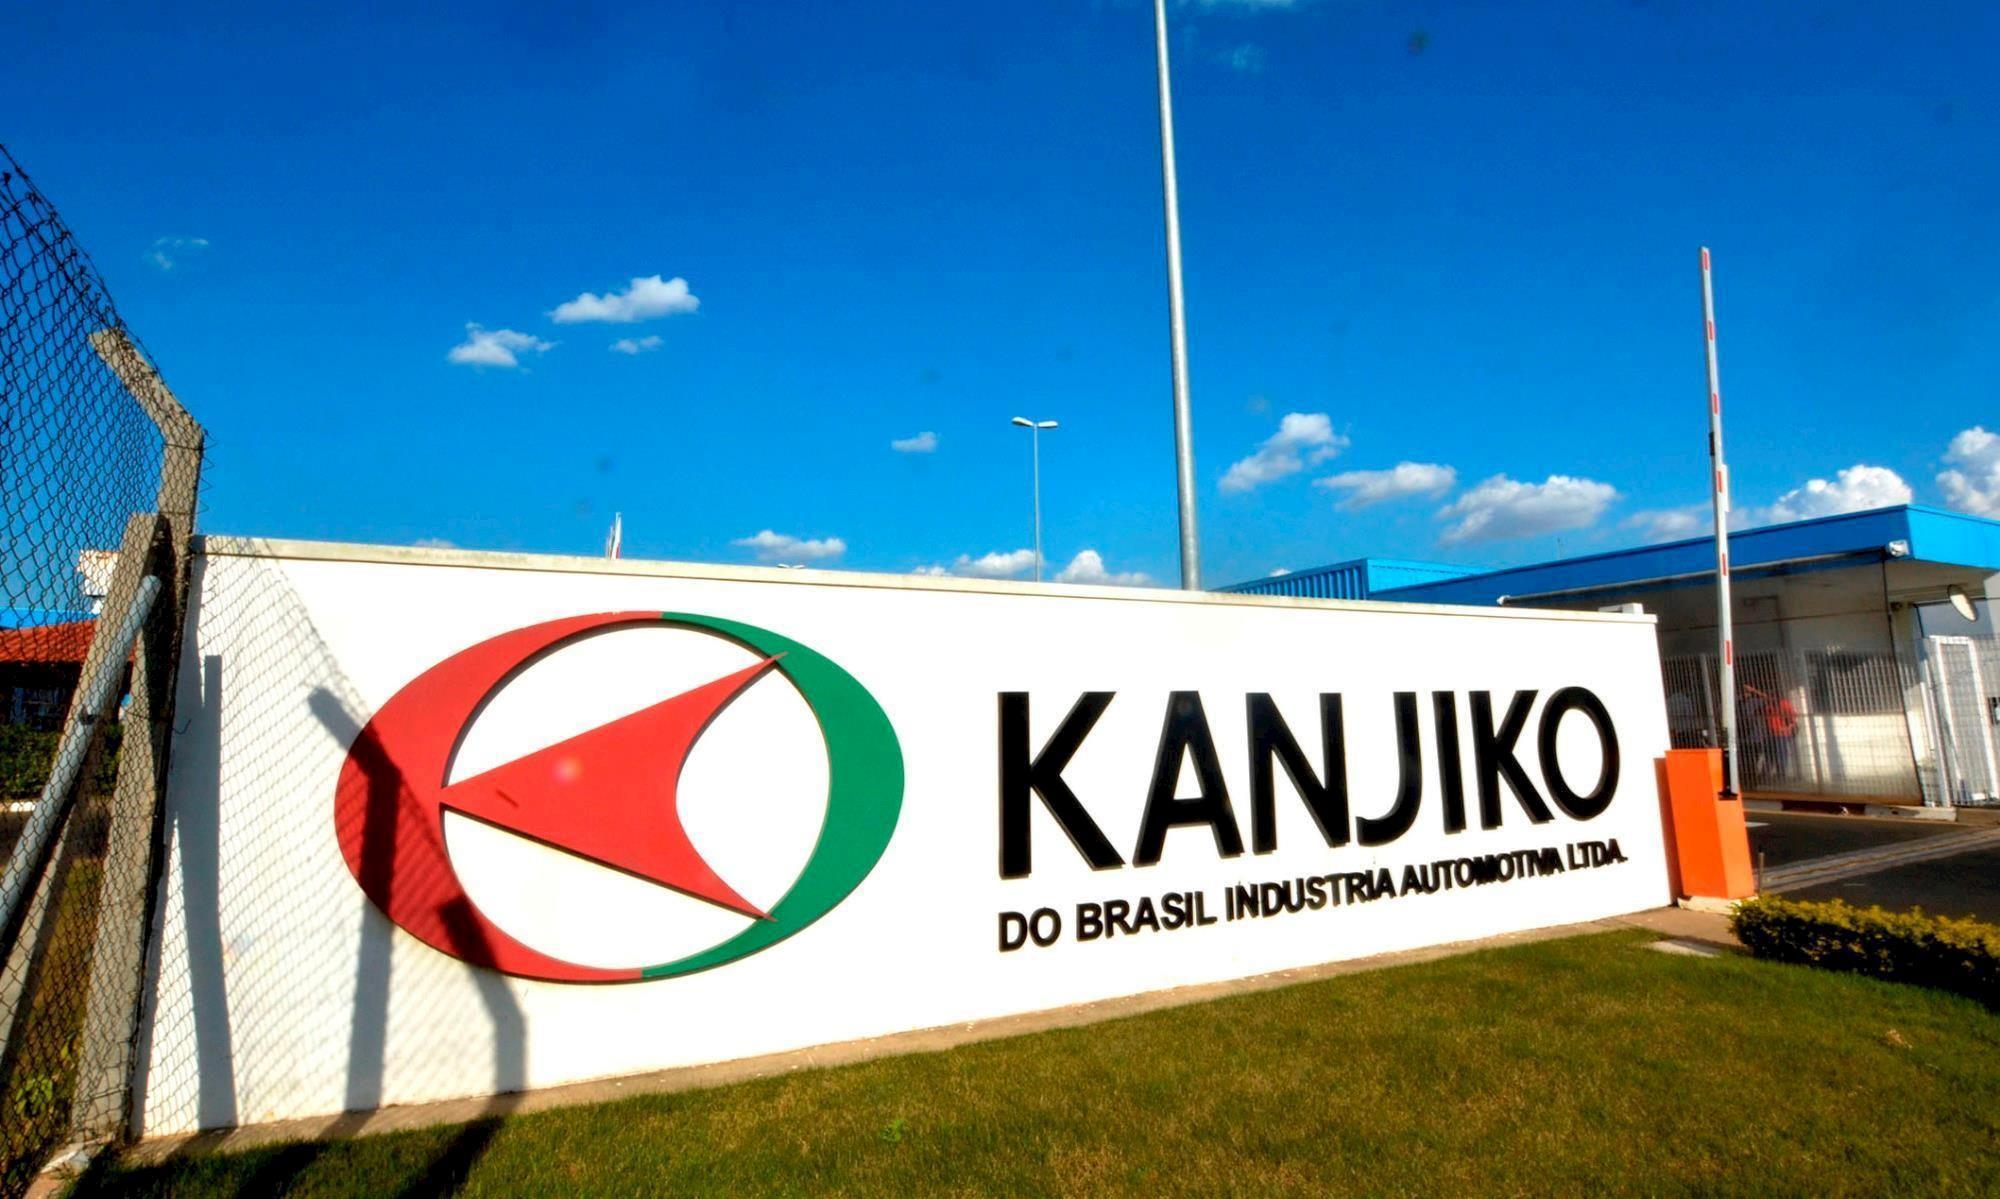 kanjiko, smetal, fachada, sistemista, Arquivo/Foguinho Imprensa SMetal